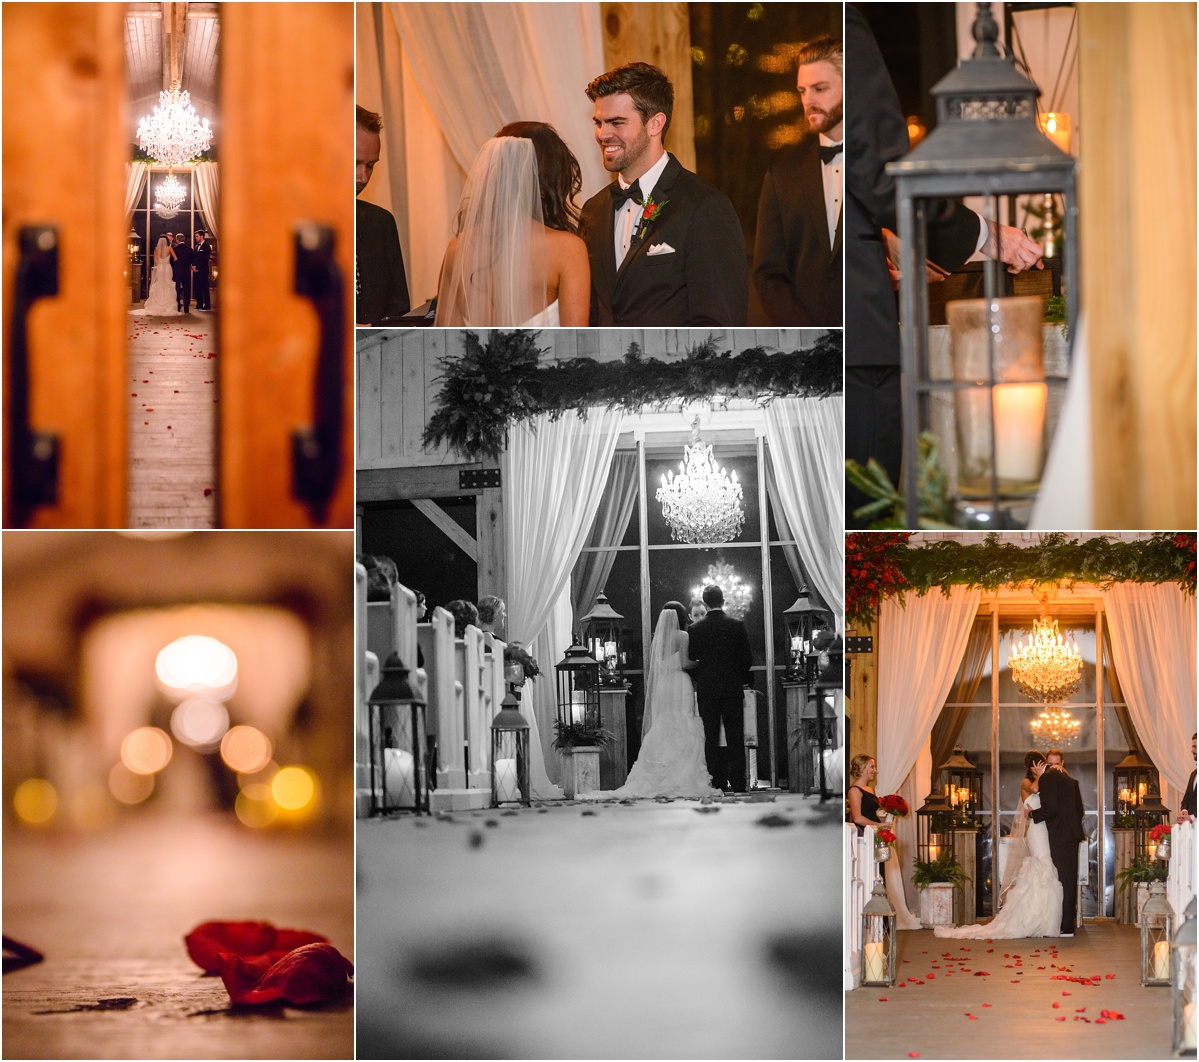 Greg Smit Photography Nashville wedding photographer Mint Springs Farm_0025